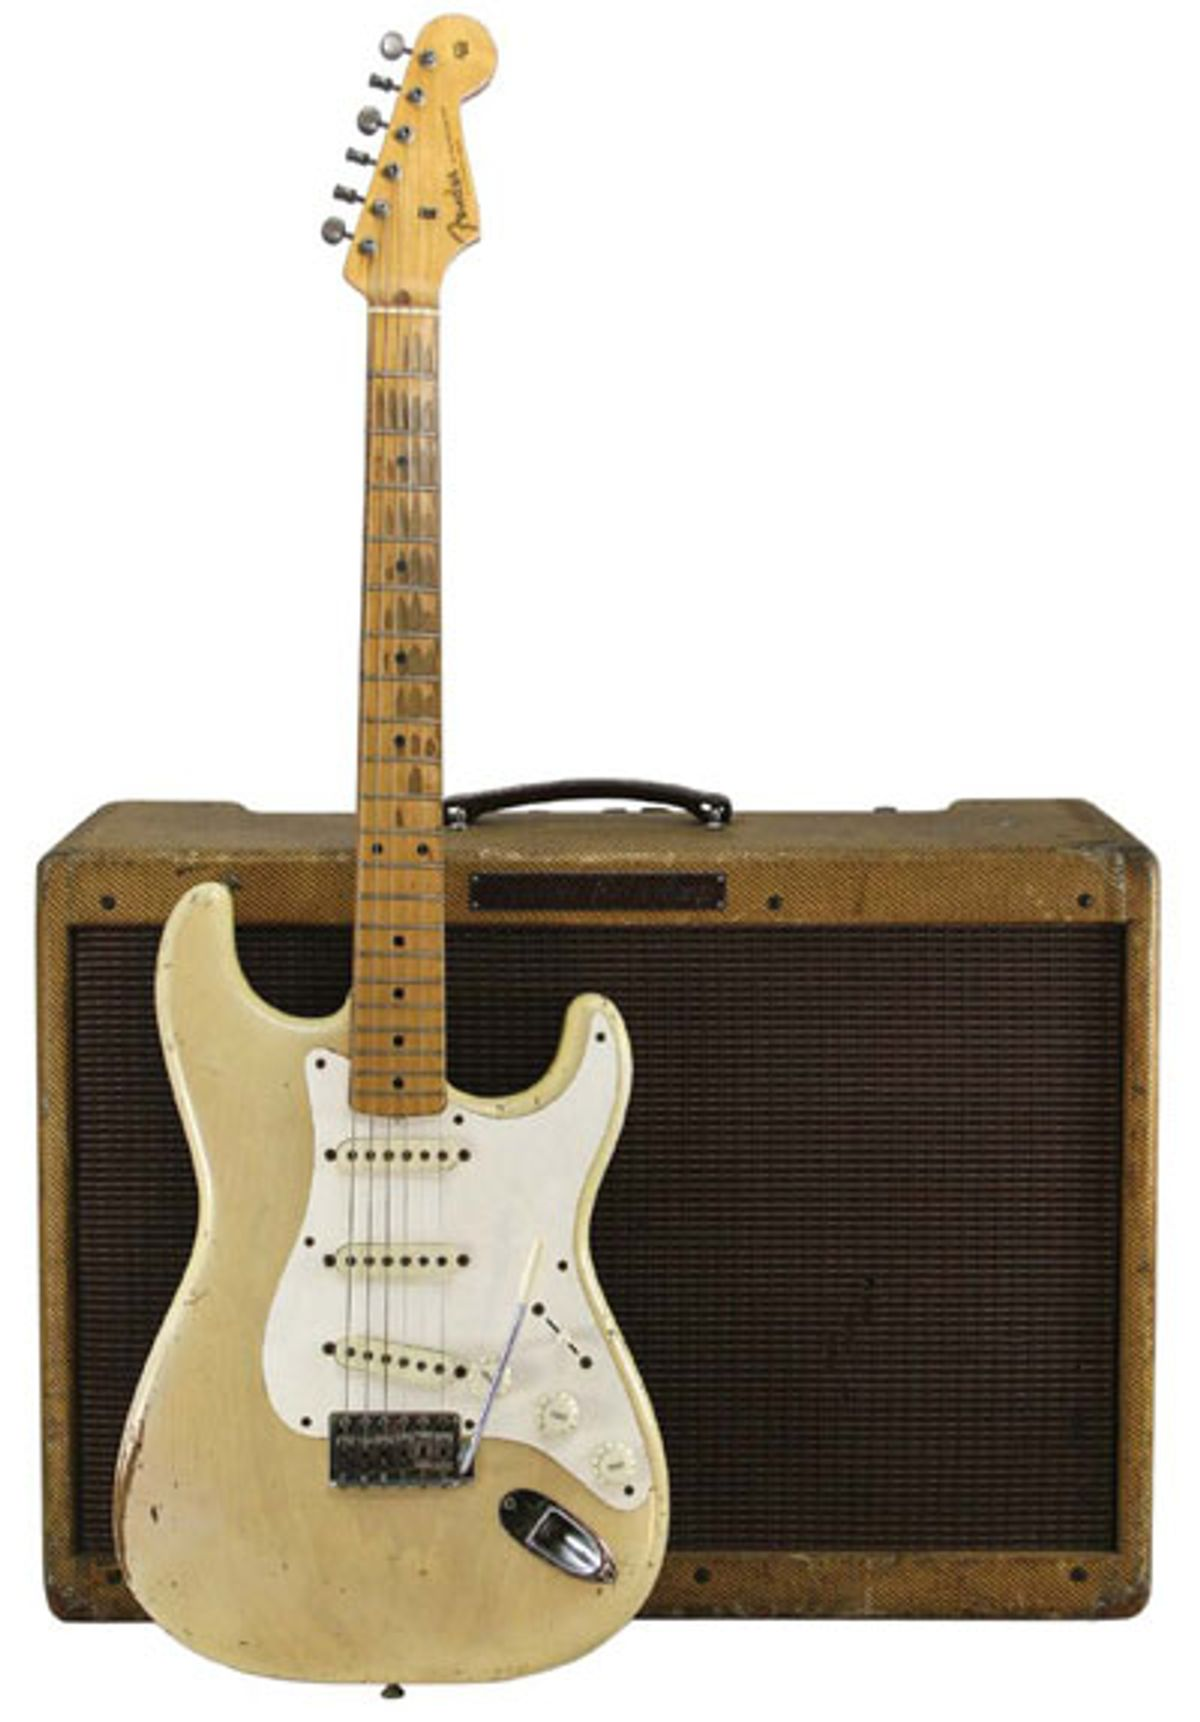 1958 Fender Strat & 1959 Fender Twin